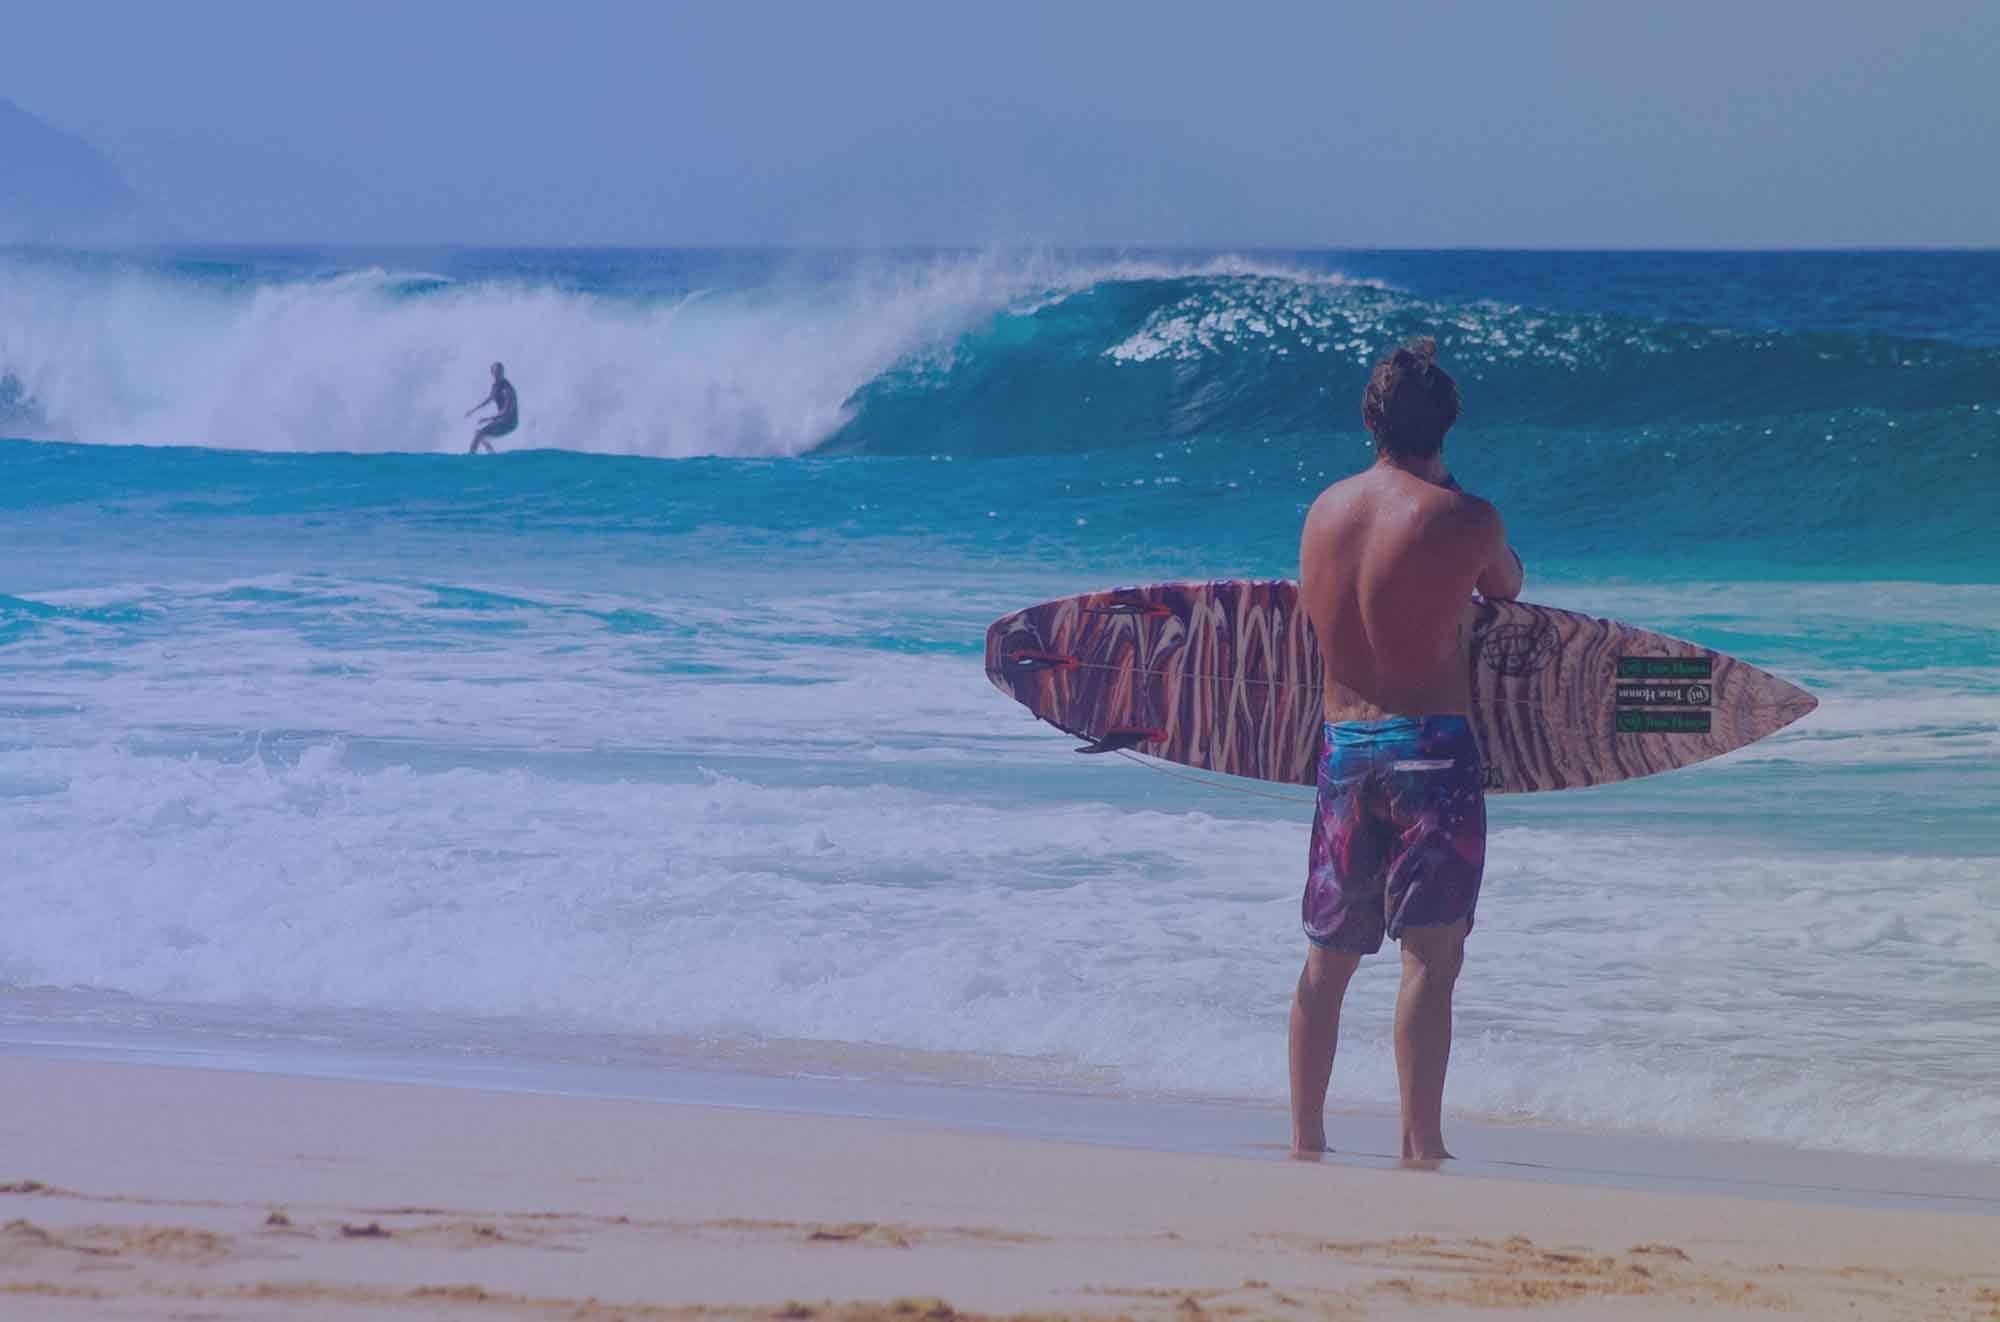 Surfer watching the beach in San Diego